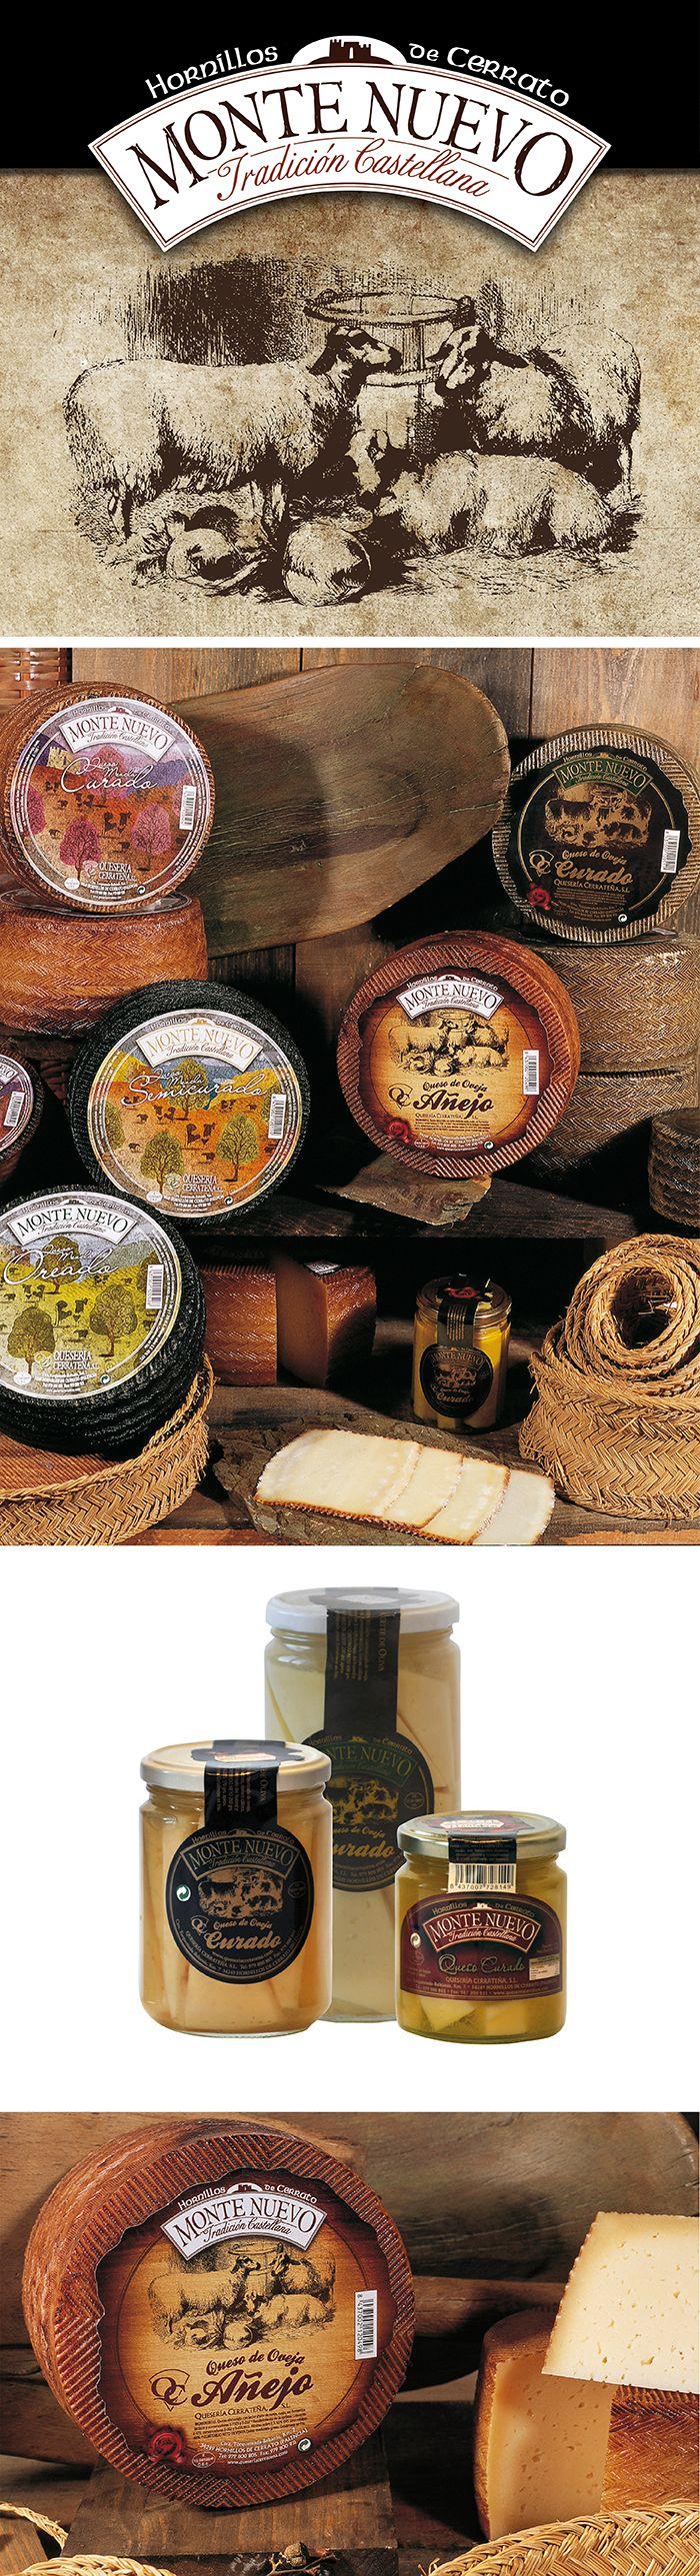 Cheese label design.